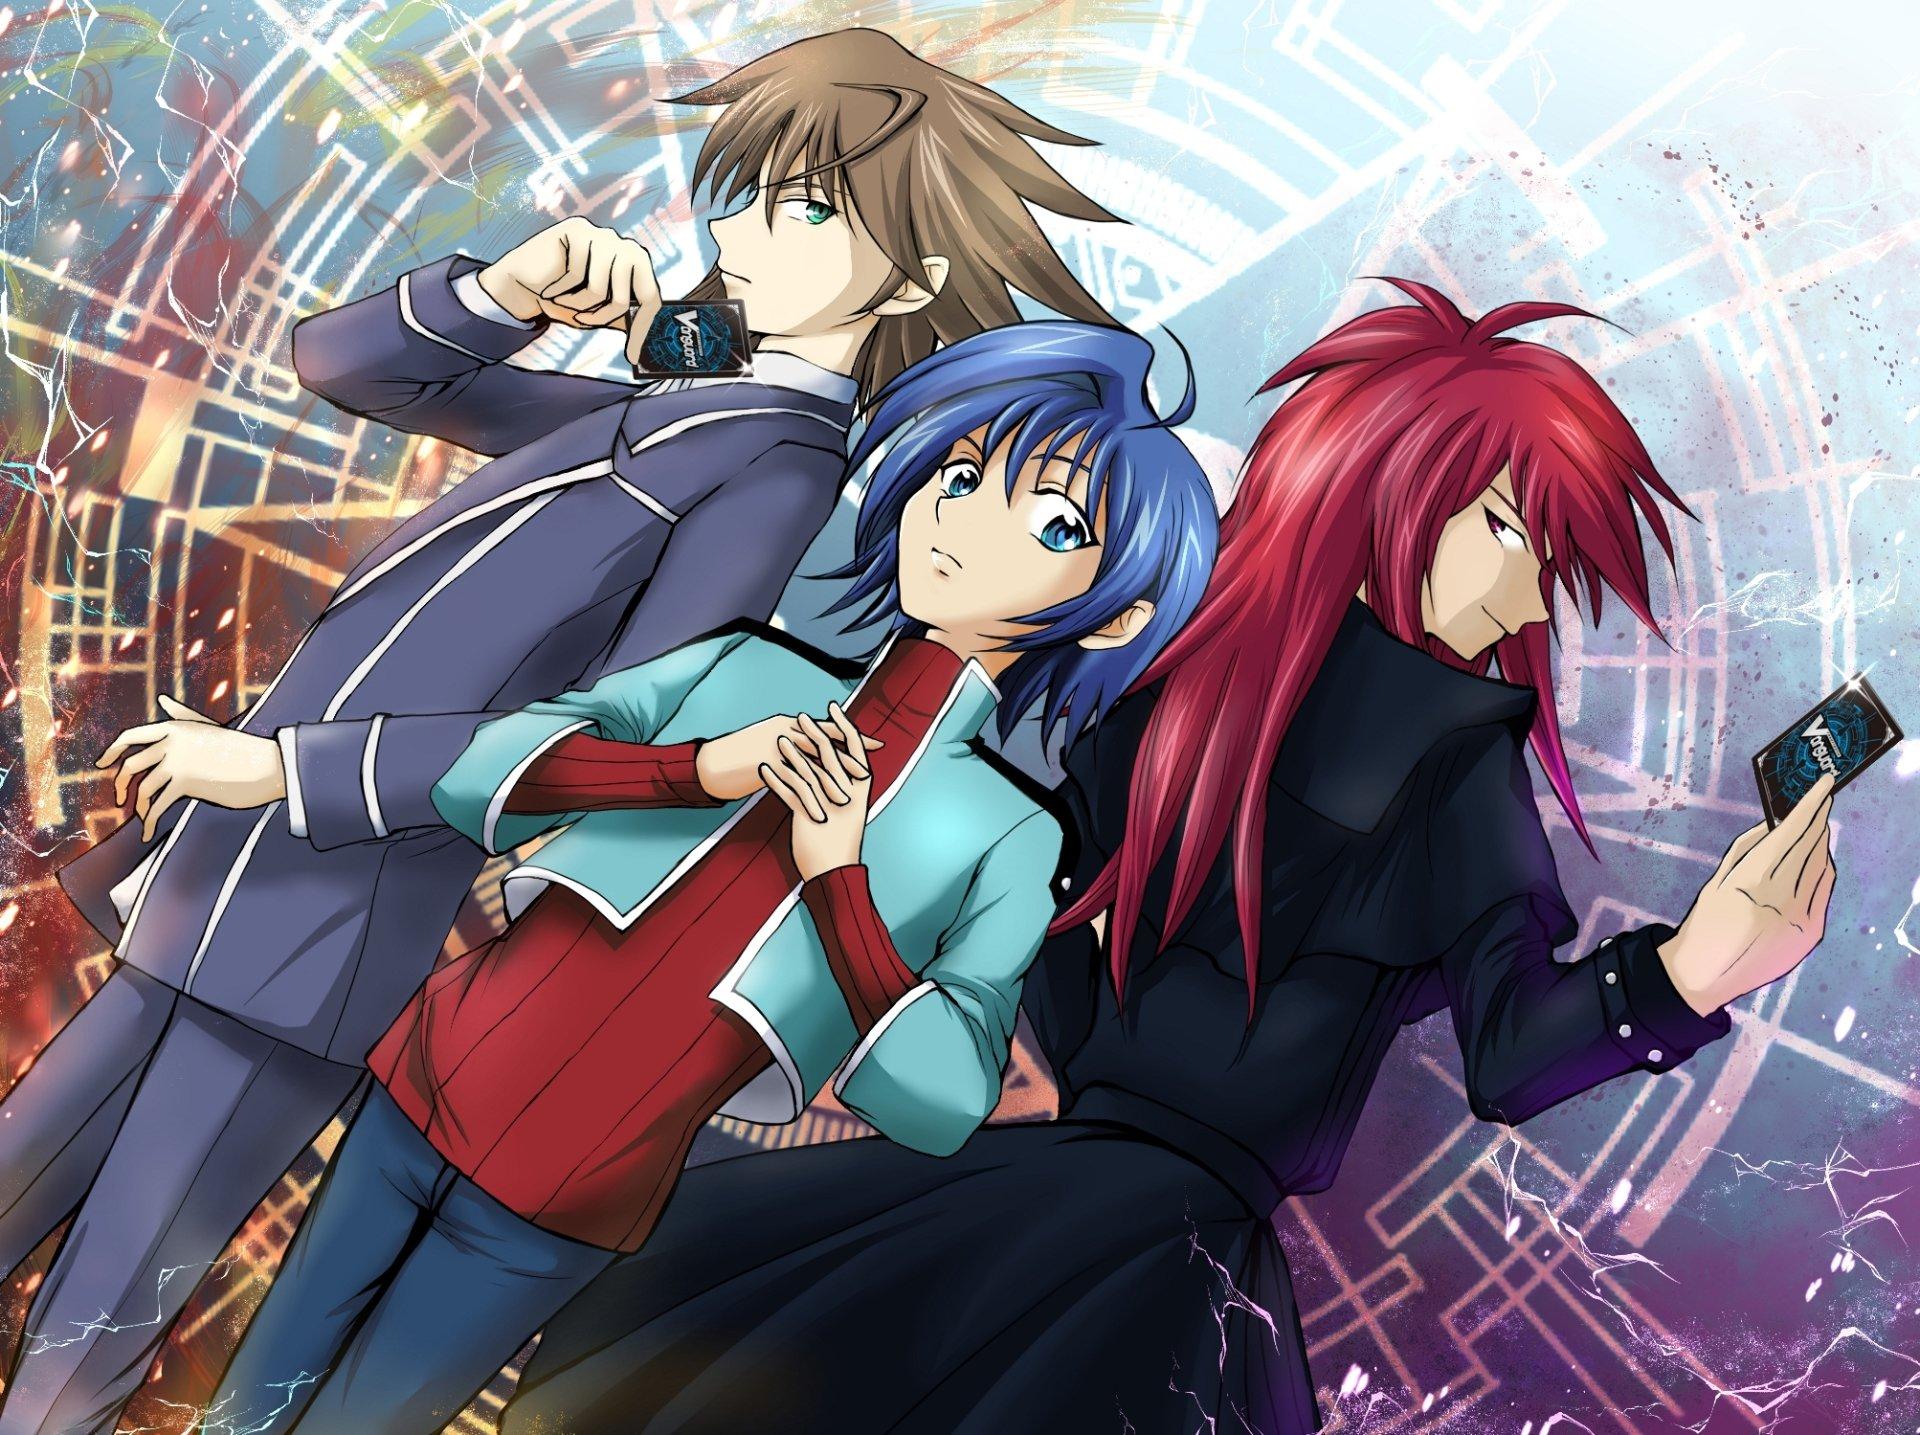 Anime - Cardfight!! Vanguard  Wallpaper